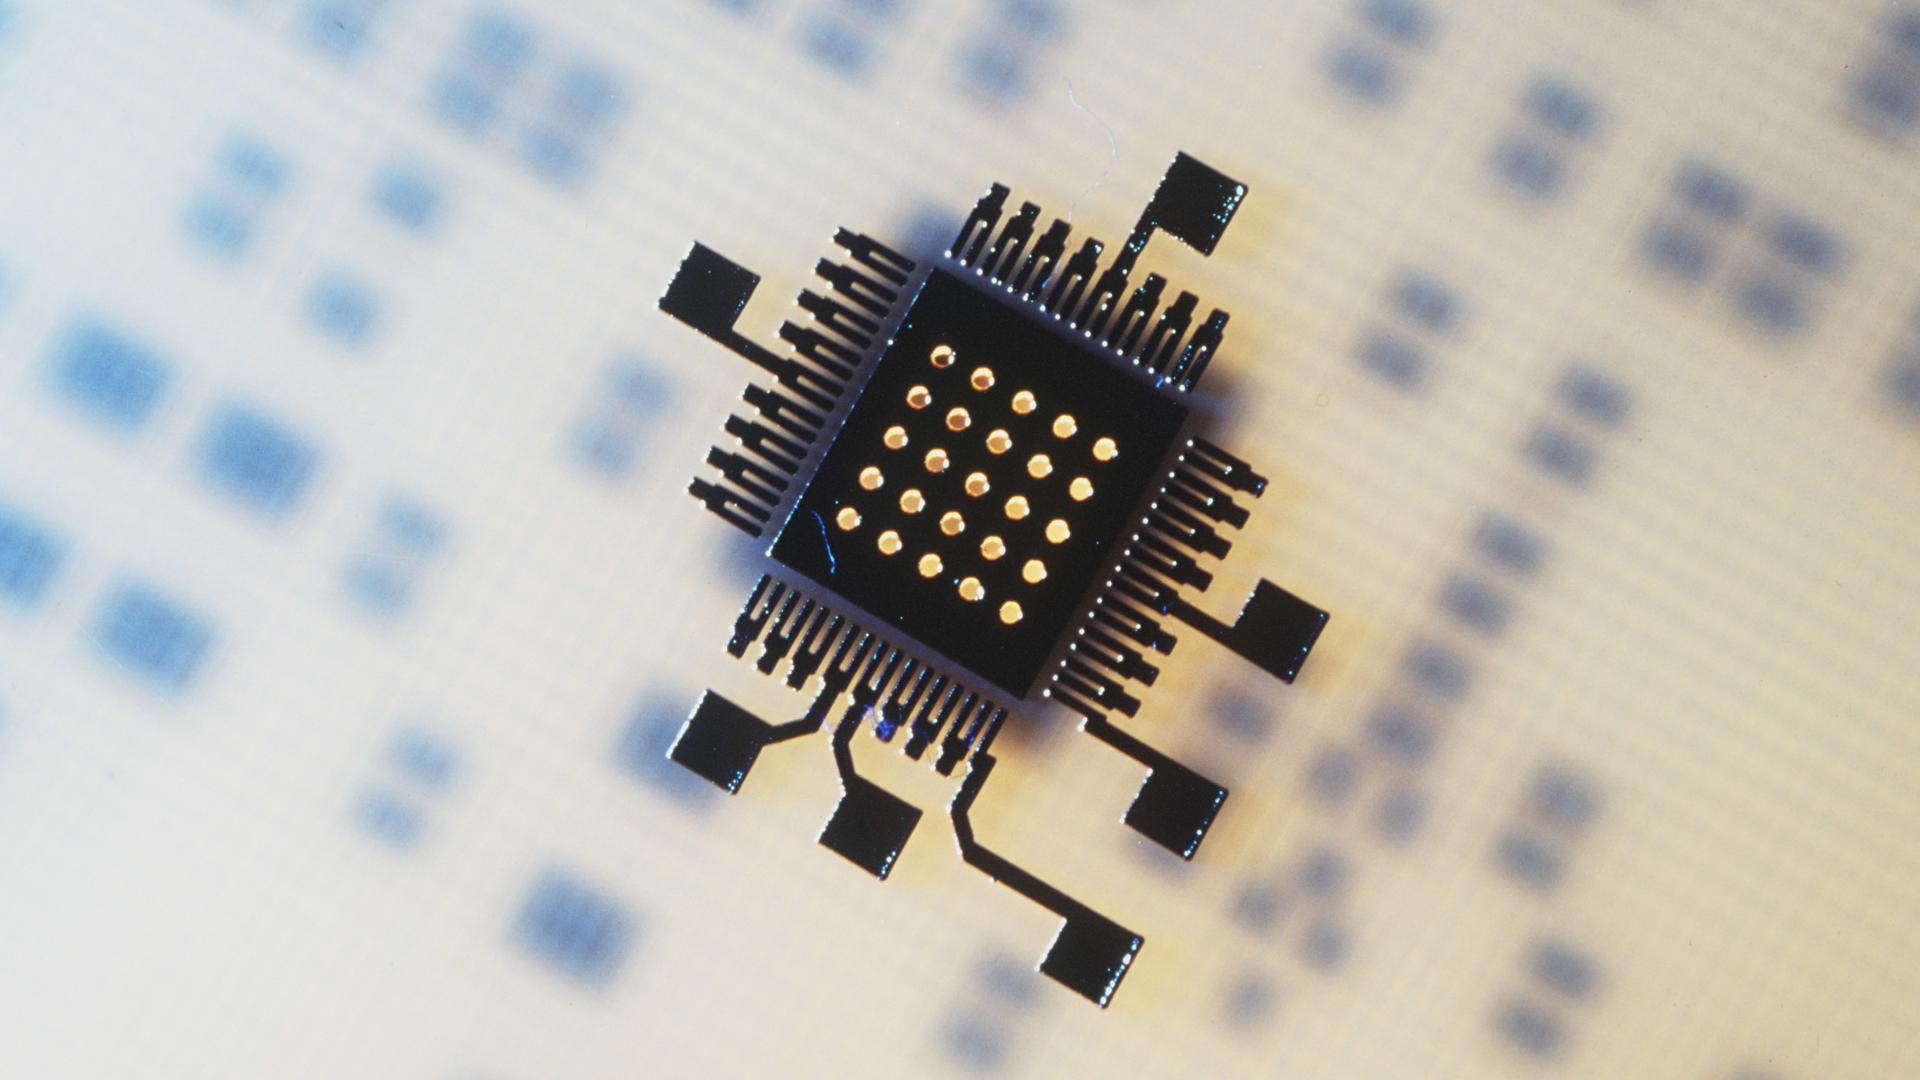 chip algemeen alt 16x9